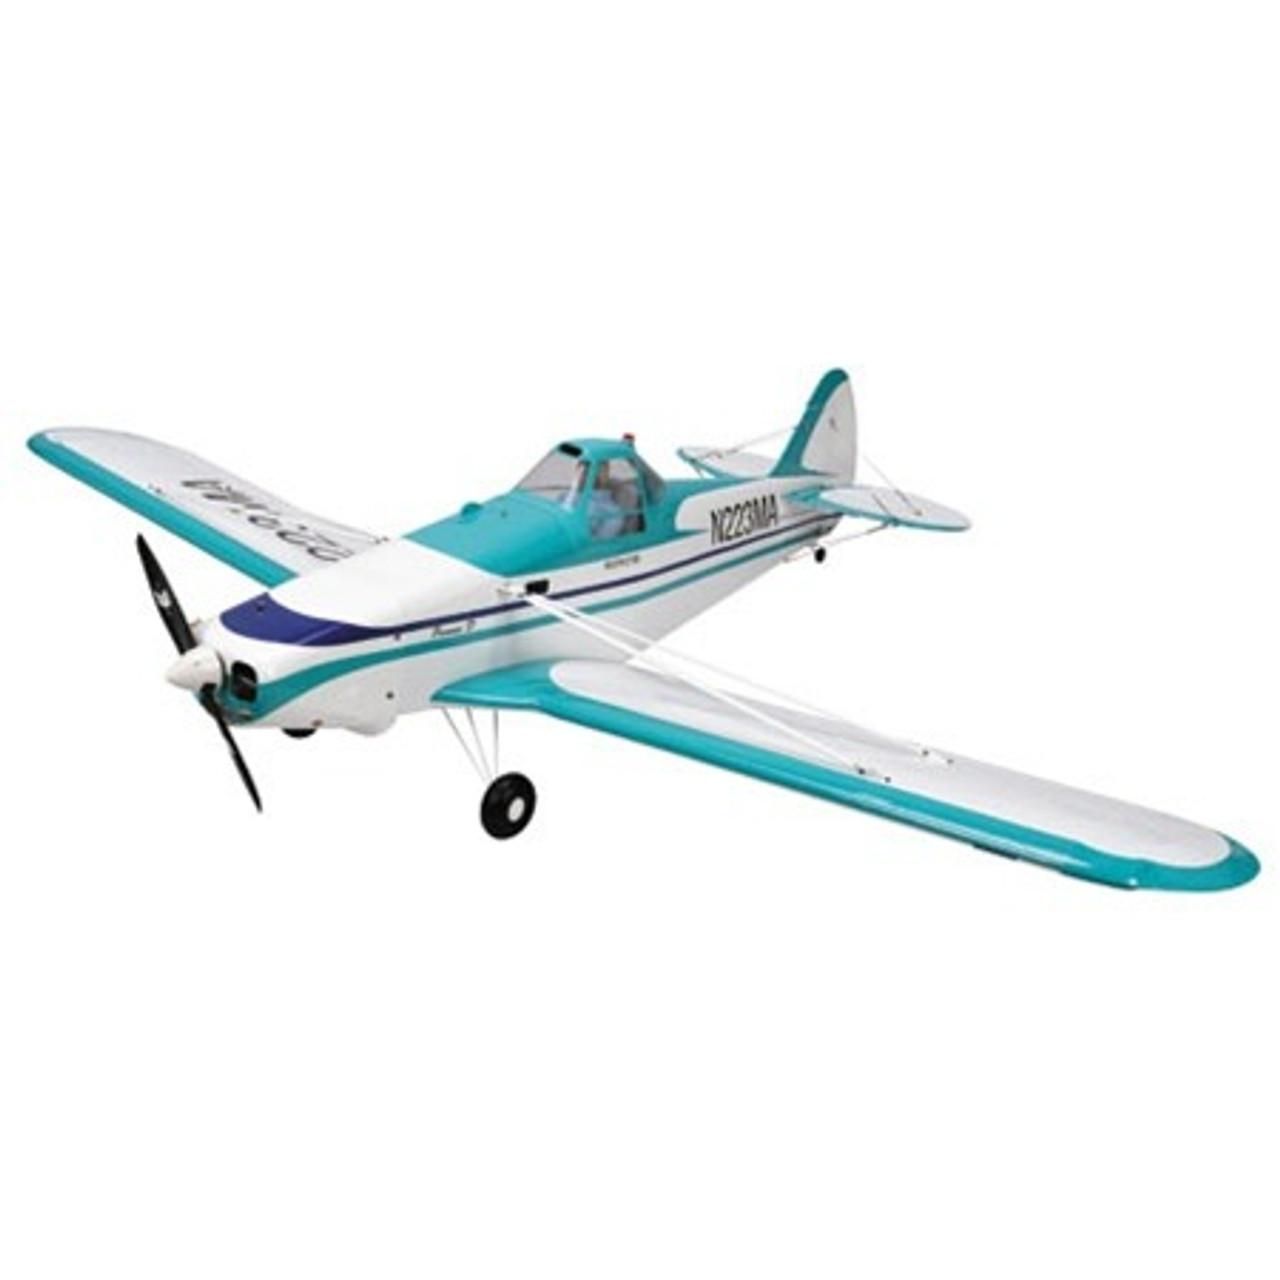 Hangar 9 Piper Pawnee 40 ARF Airplane